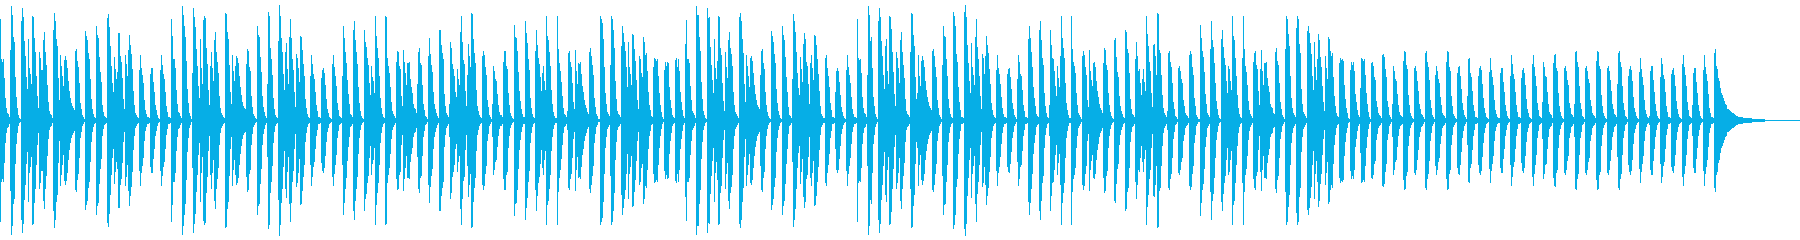 YouTube・日常・ほのぼのピアノソロの再生済みの波形